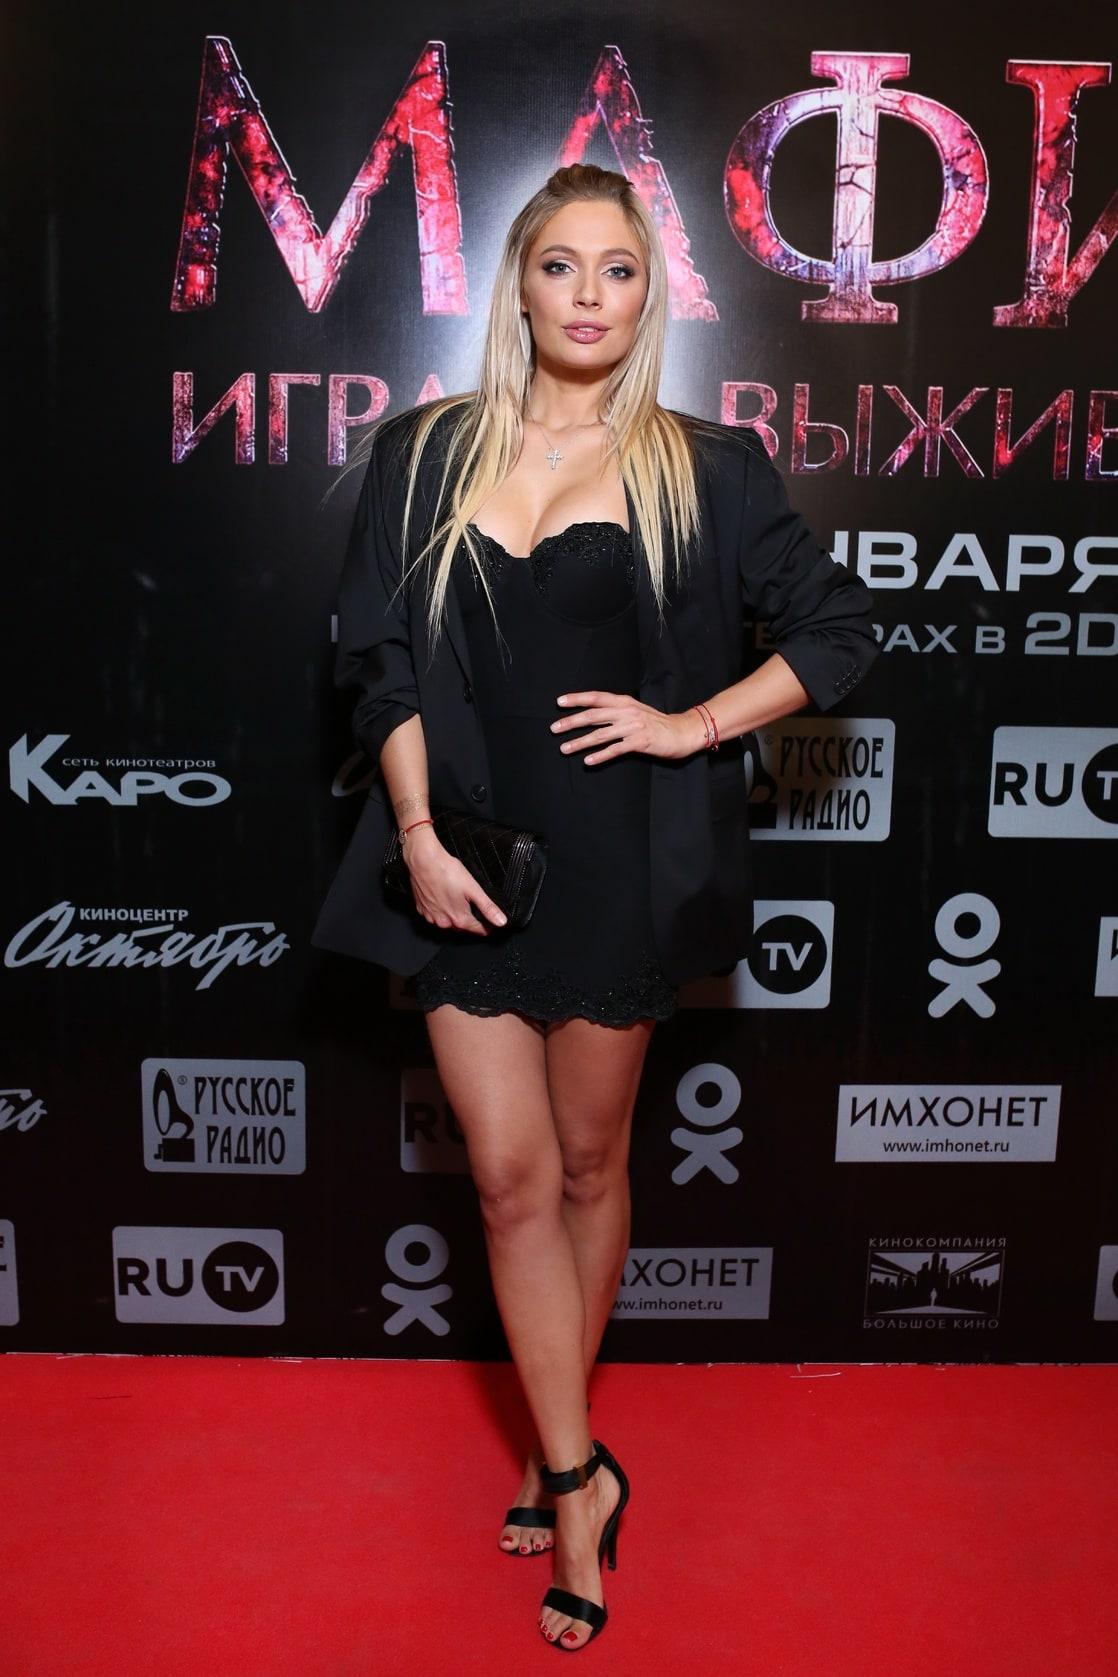 Fotos Natalya Rudova nude photos 2019